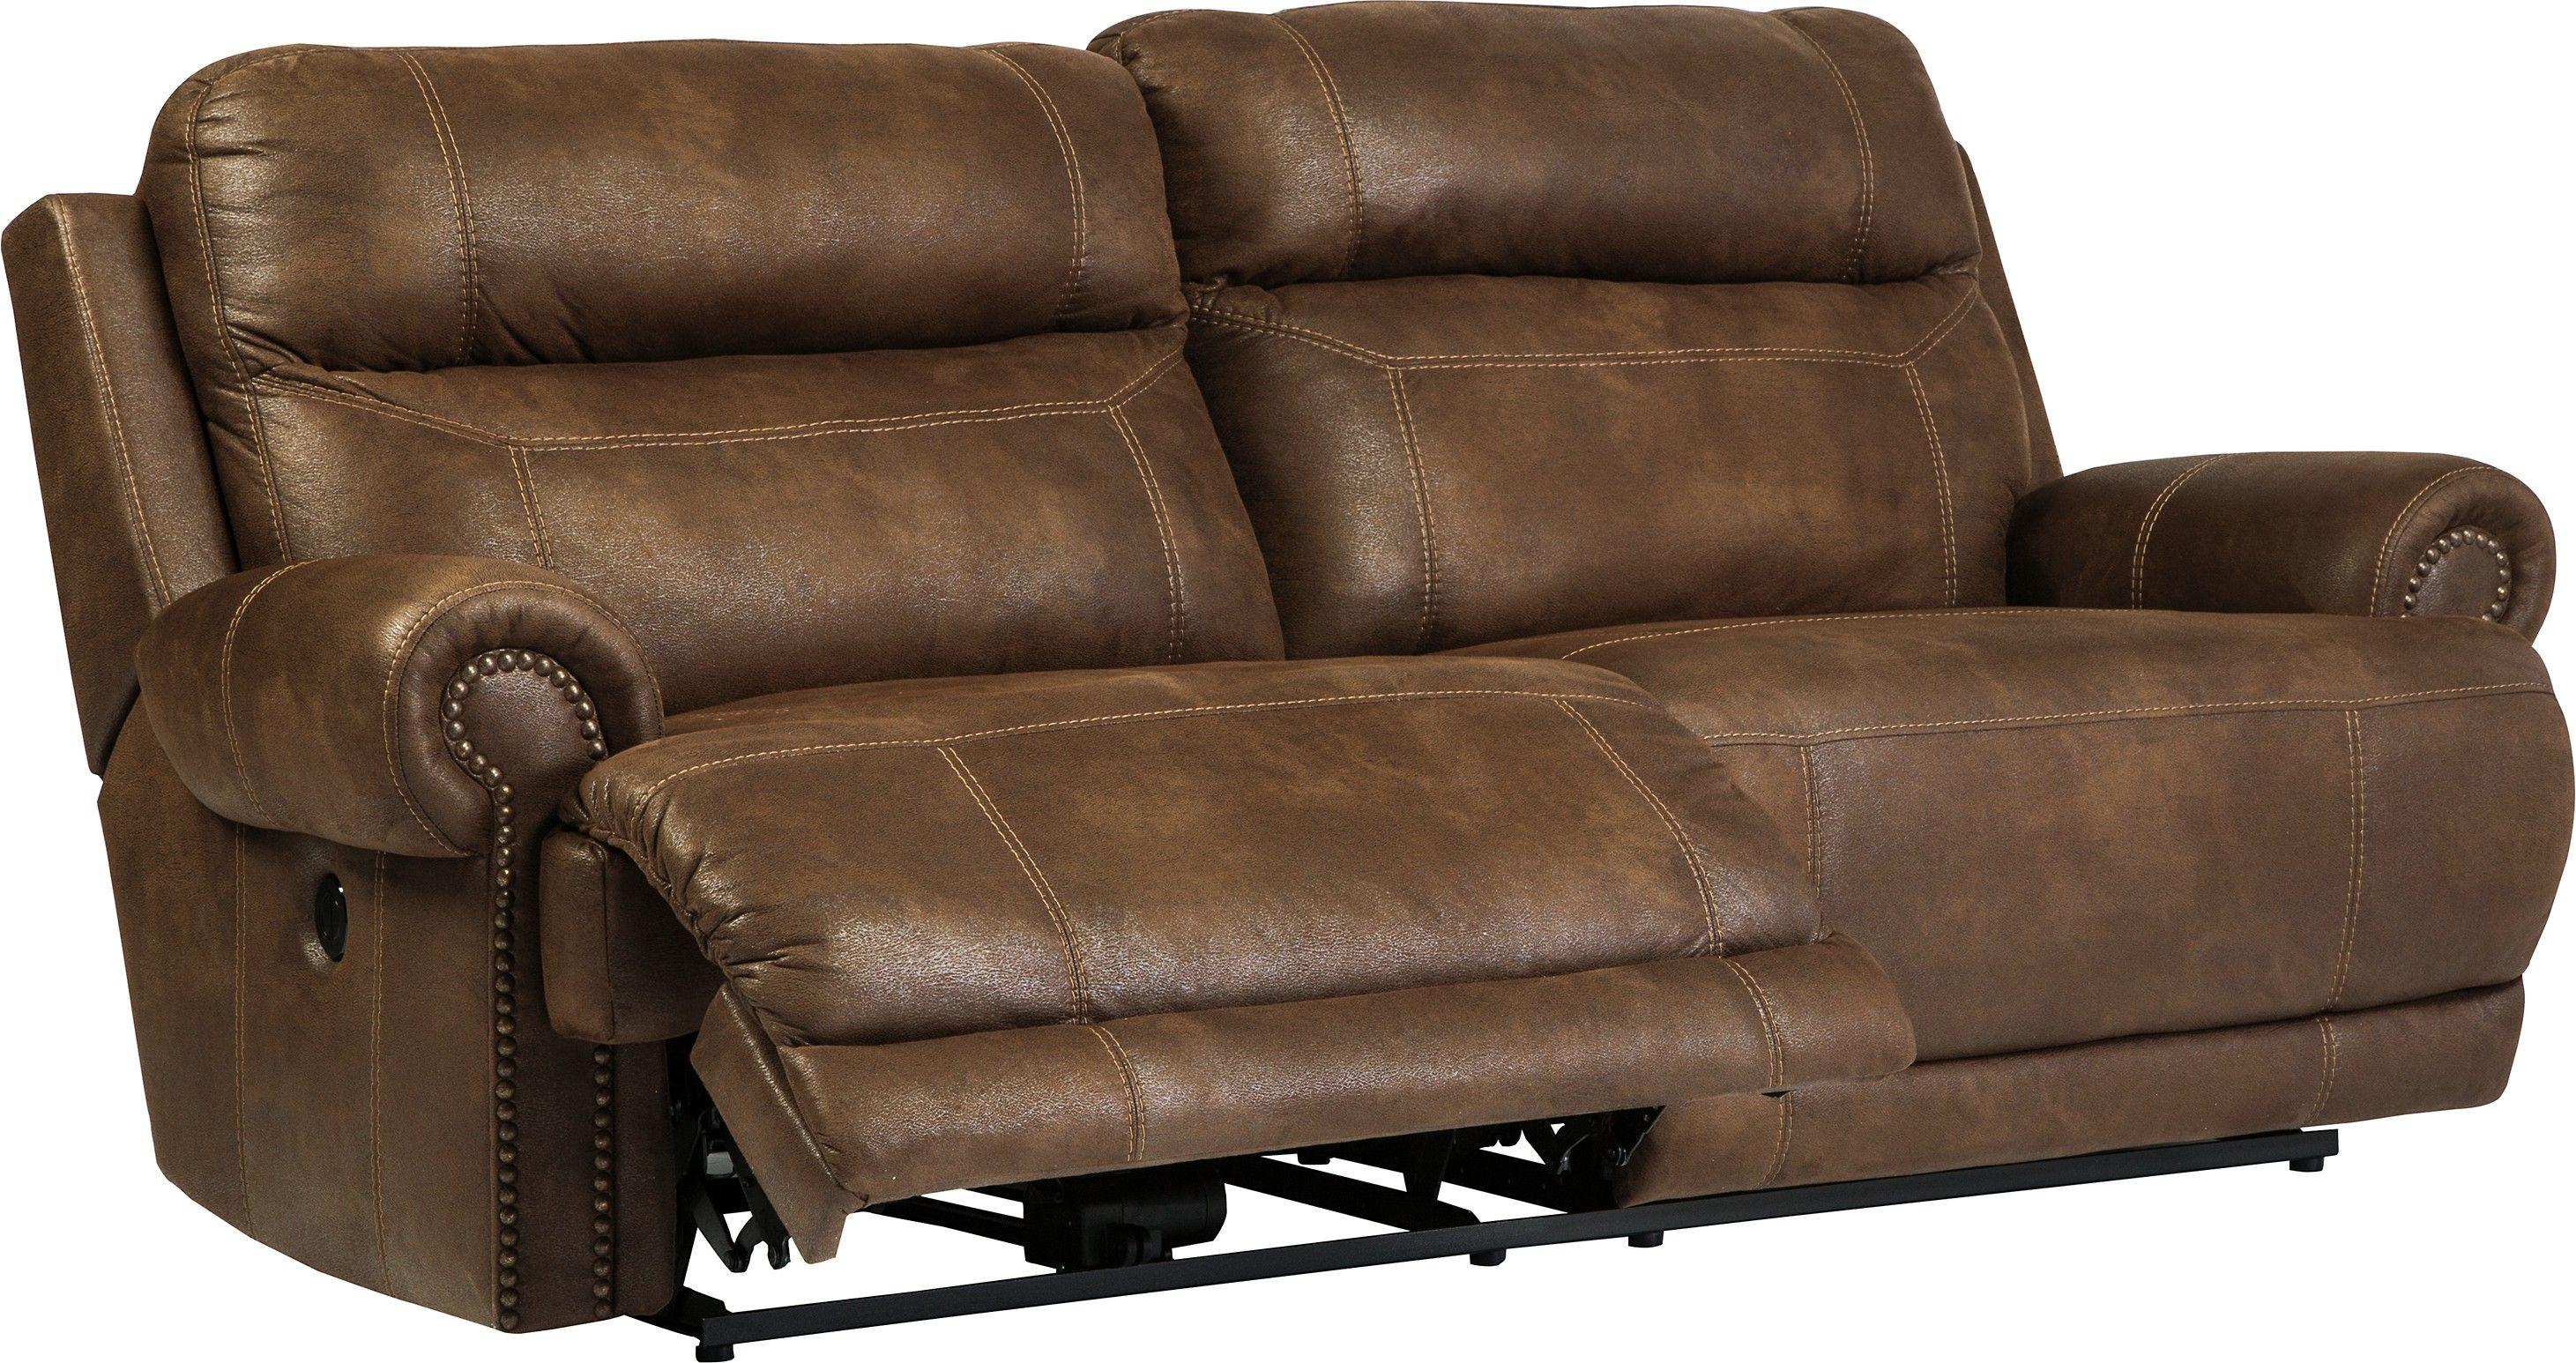 Ashley Austere 3840047 Signature Design 2 Seat Reclining